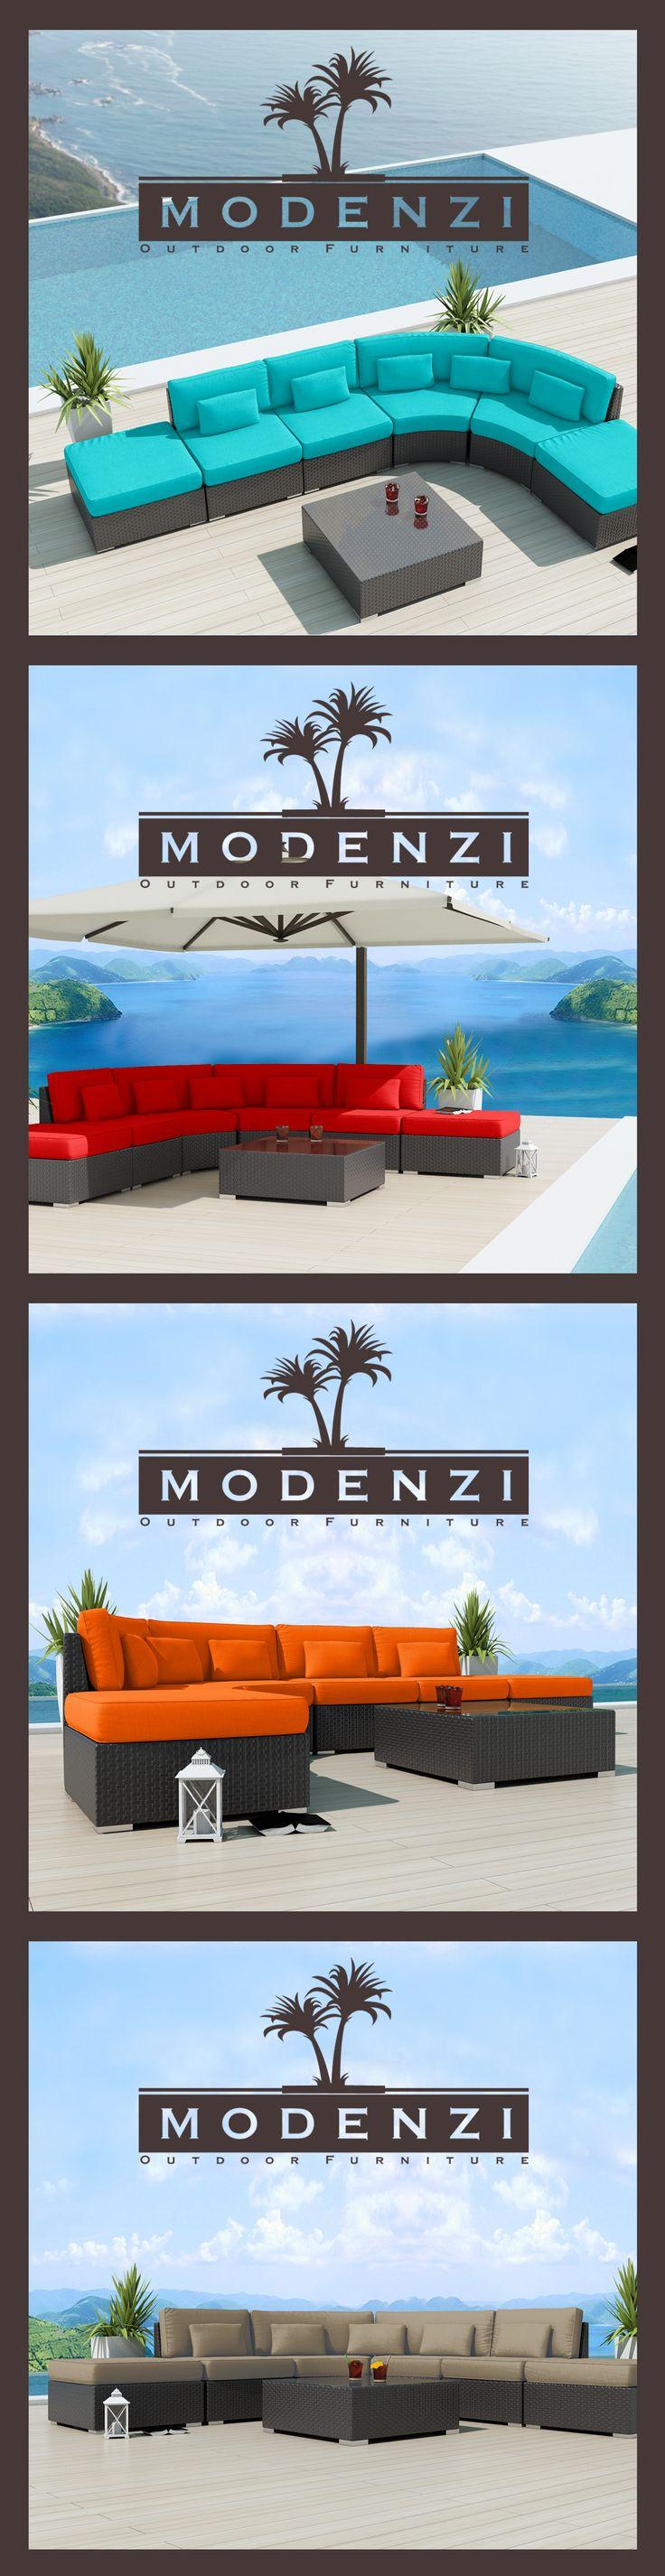 Modenzi 7x Modern Patio Rattan Wicker Set Outdoor Sectional Sofa Furniture Chair 9 Colors Beautiful ROUND CORNER Modular DESIGN